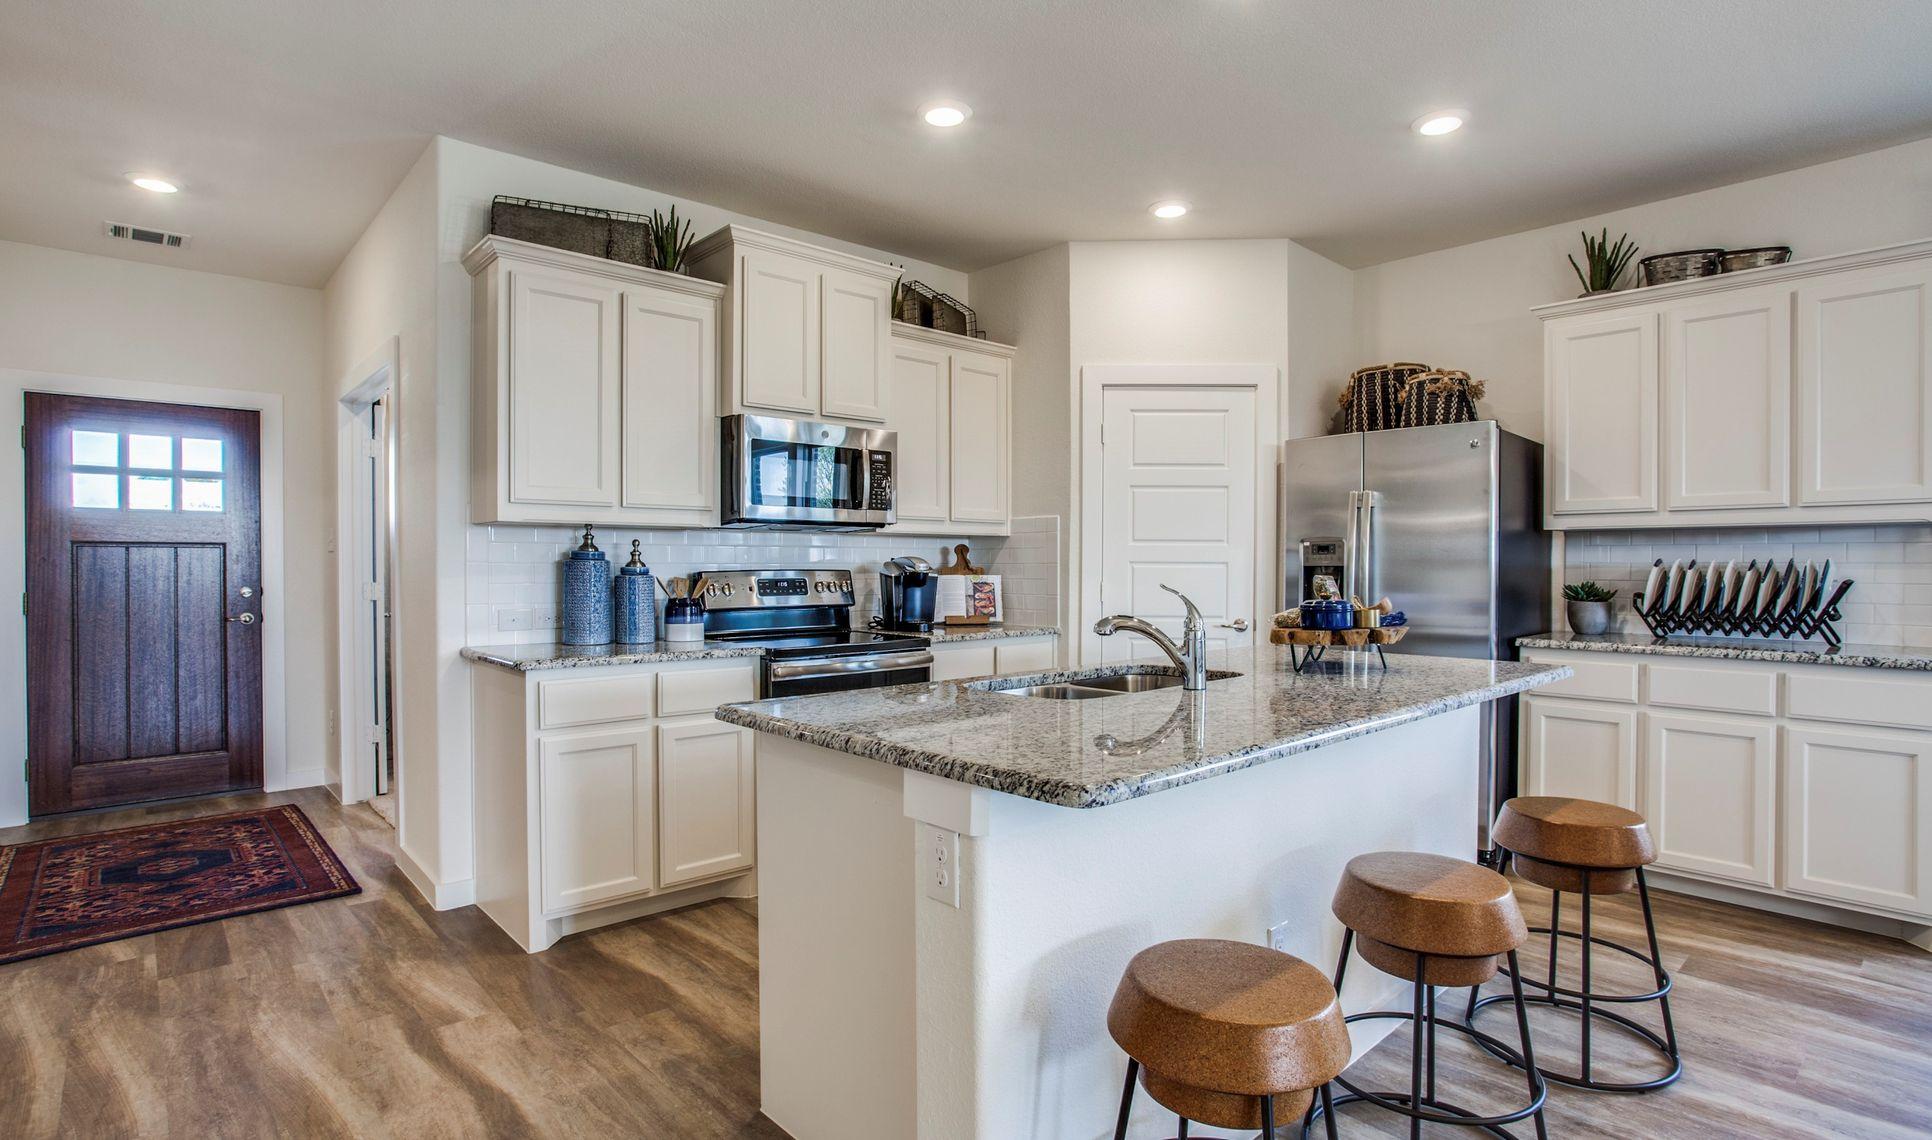 Interior:Stunning kitchen